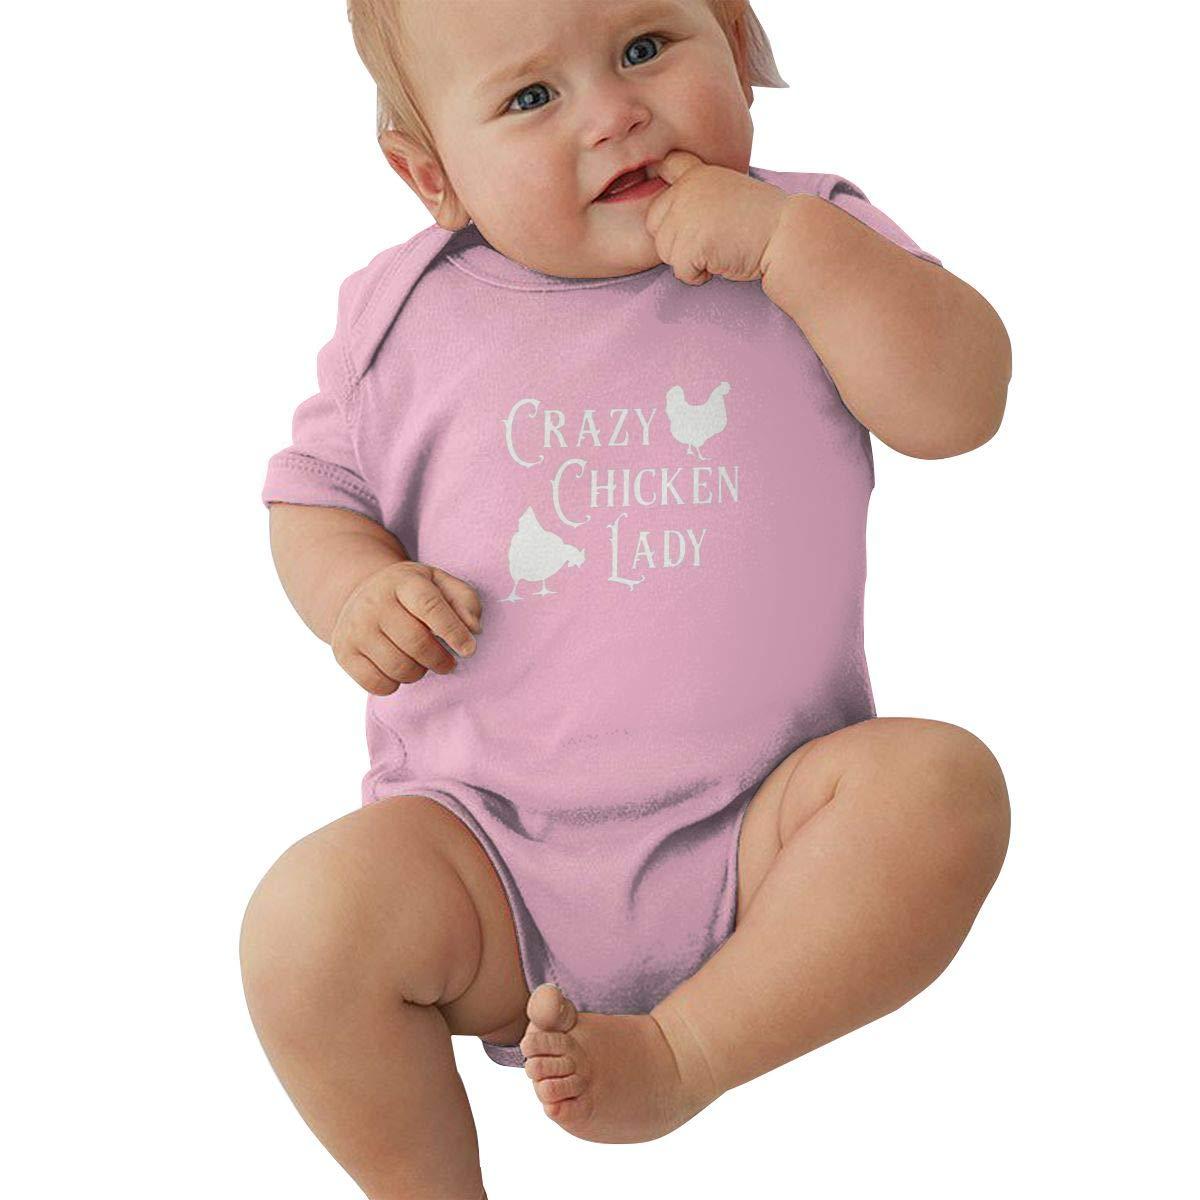 Dfenere Crazy Chicken Lady Retro Newborn Baby Short Sleeve Bodysuit Romper Infant Summer Clothing Black